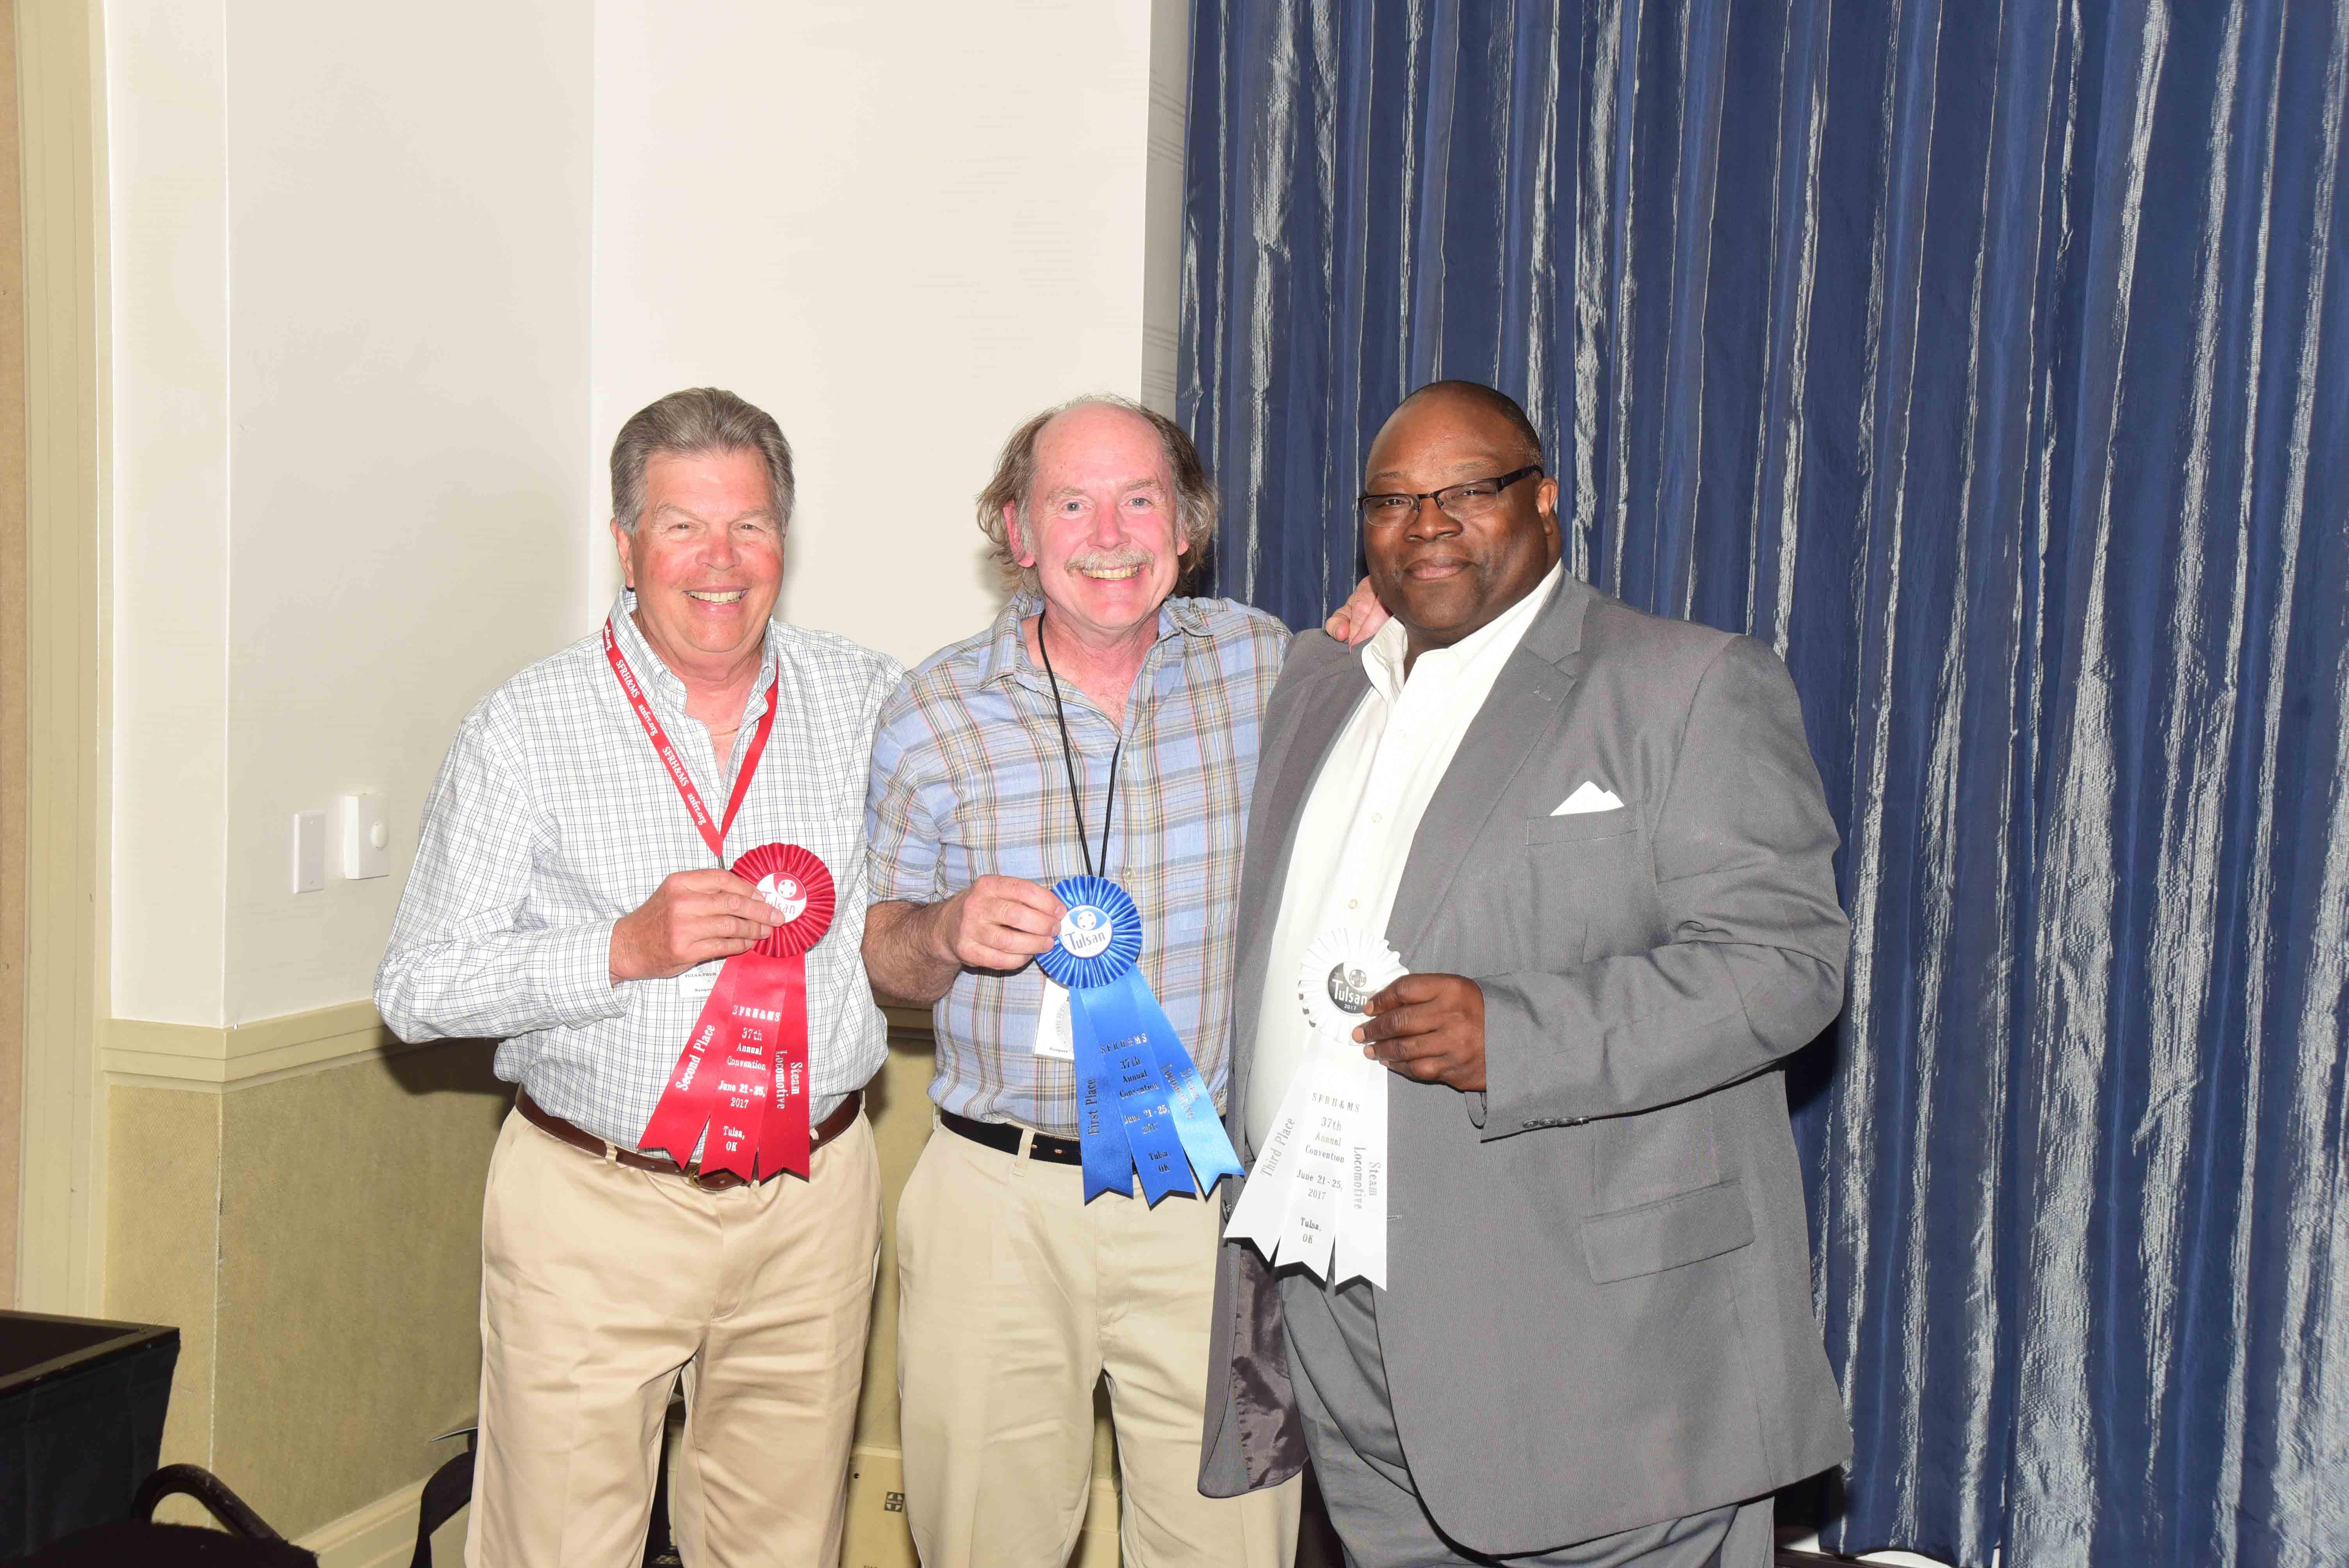 2017 ATSF Steam Locomotive model contest winners